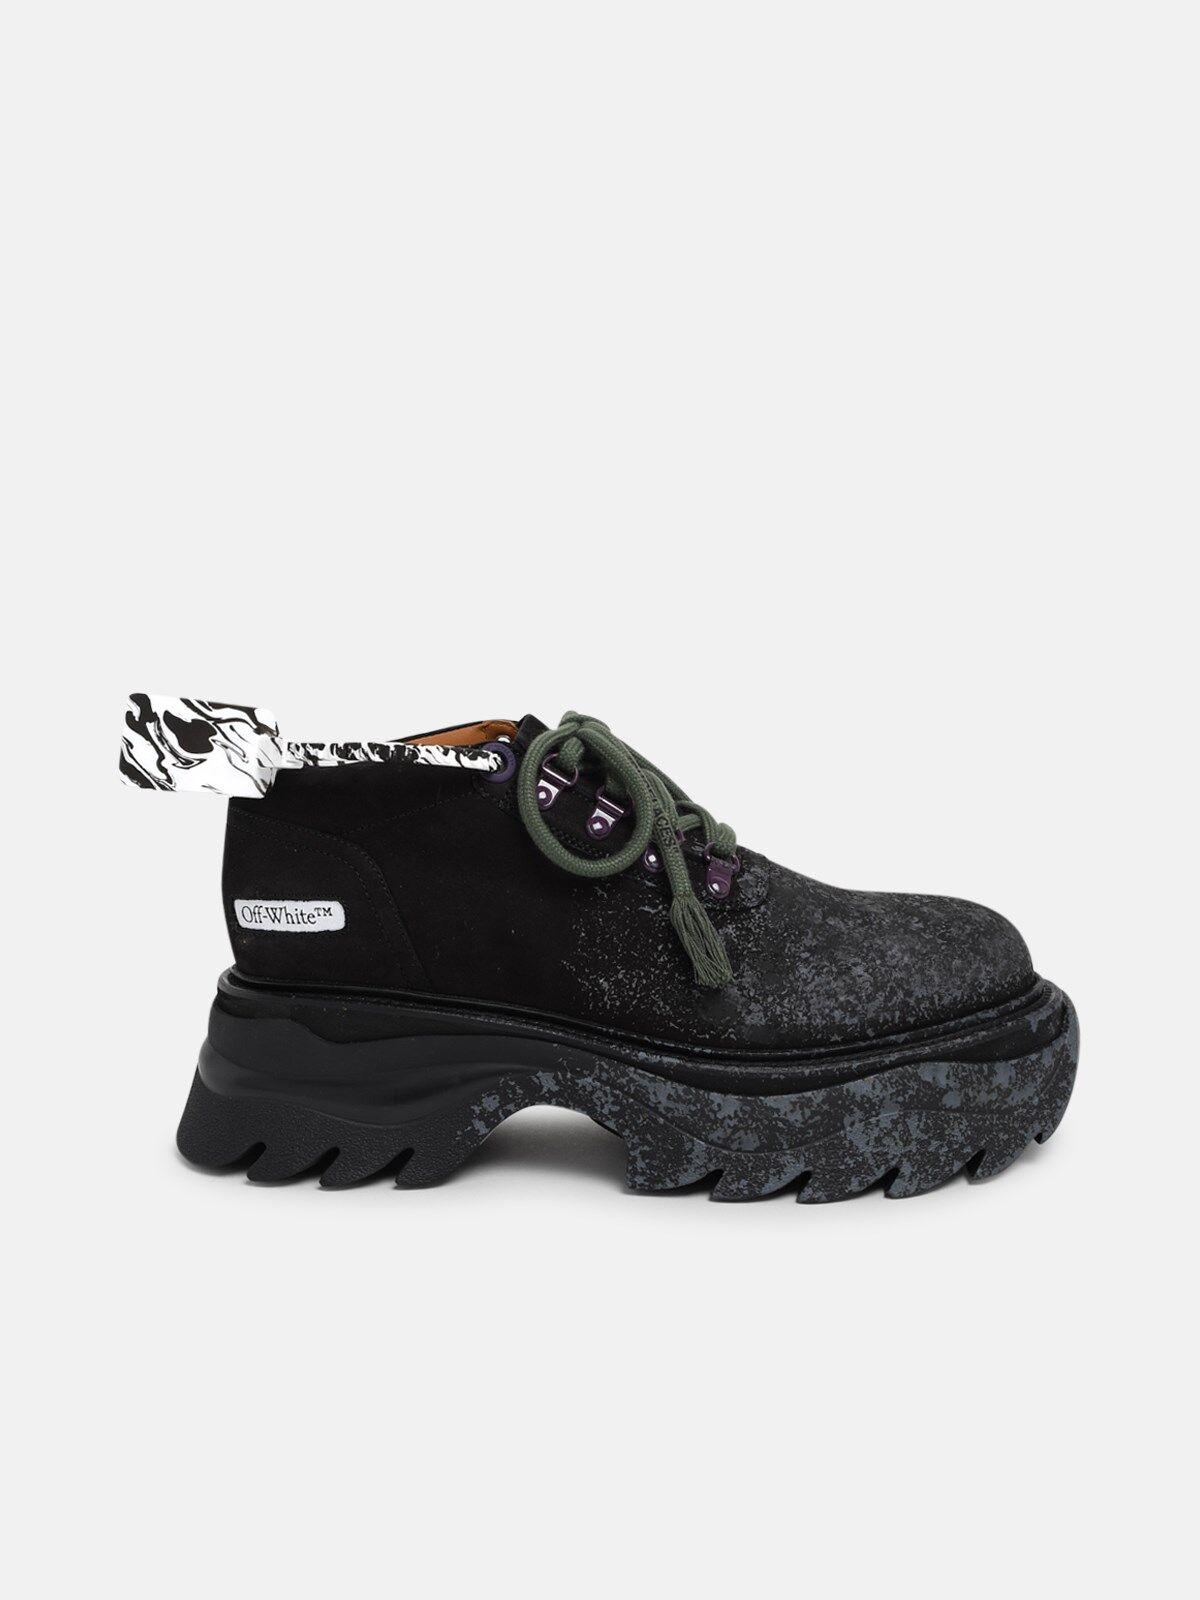 OFF WHITE Black Chunky Shoes (size: EU 44)